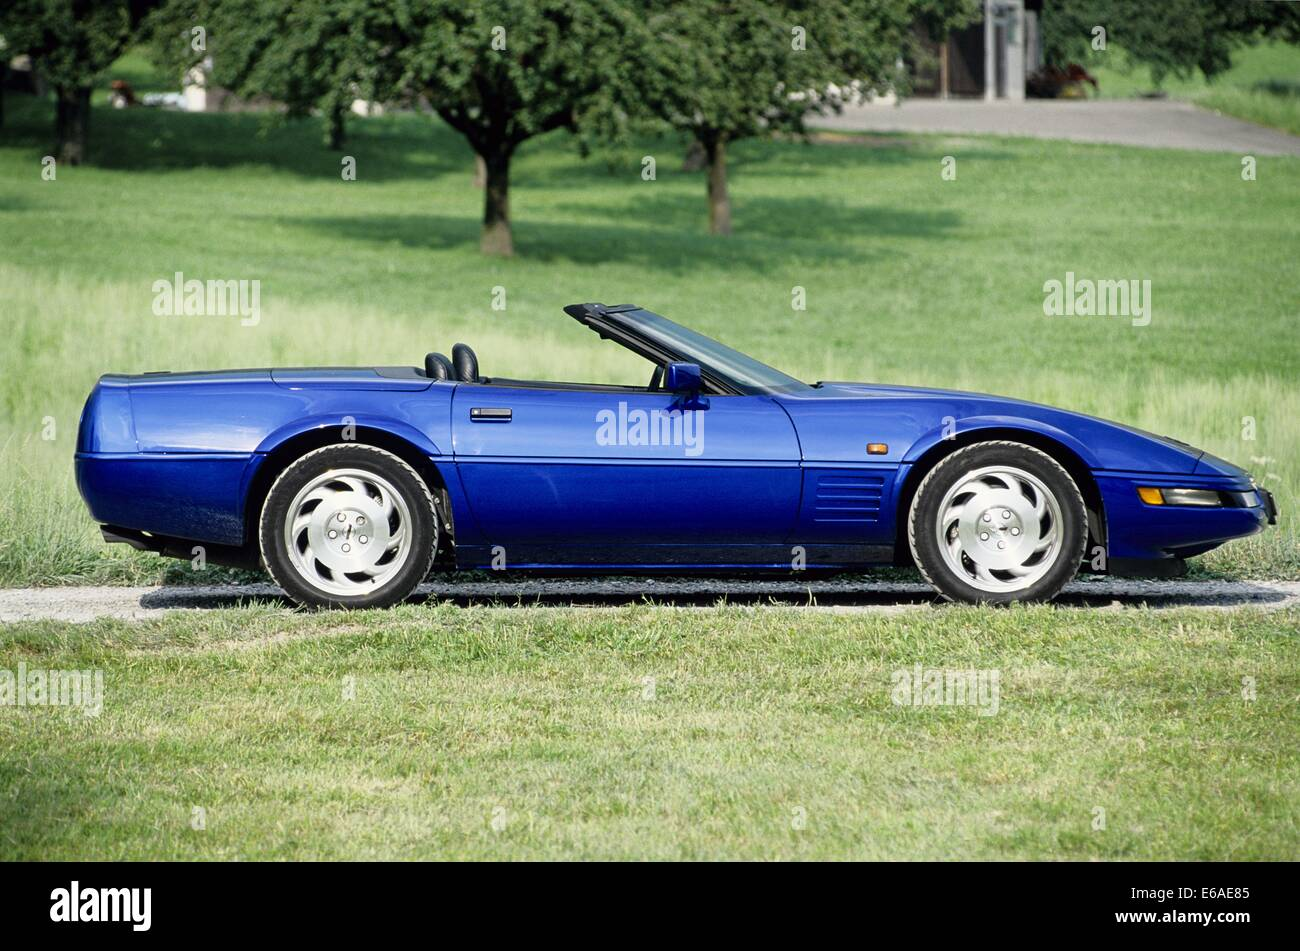 Corvette 1994 chevy corvette : Chevrolet Corvette C4 fourth generation - 1994 Model Year - side ...